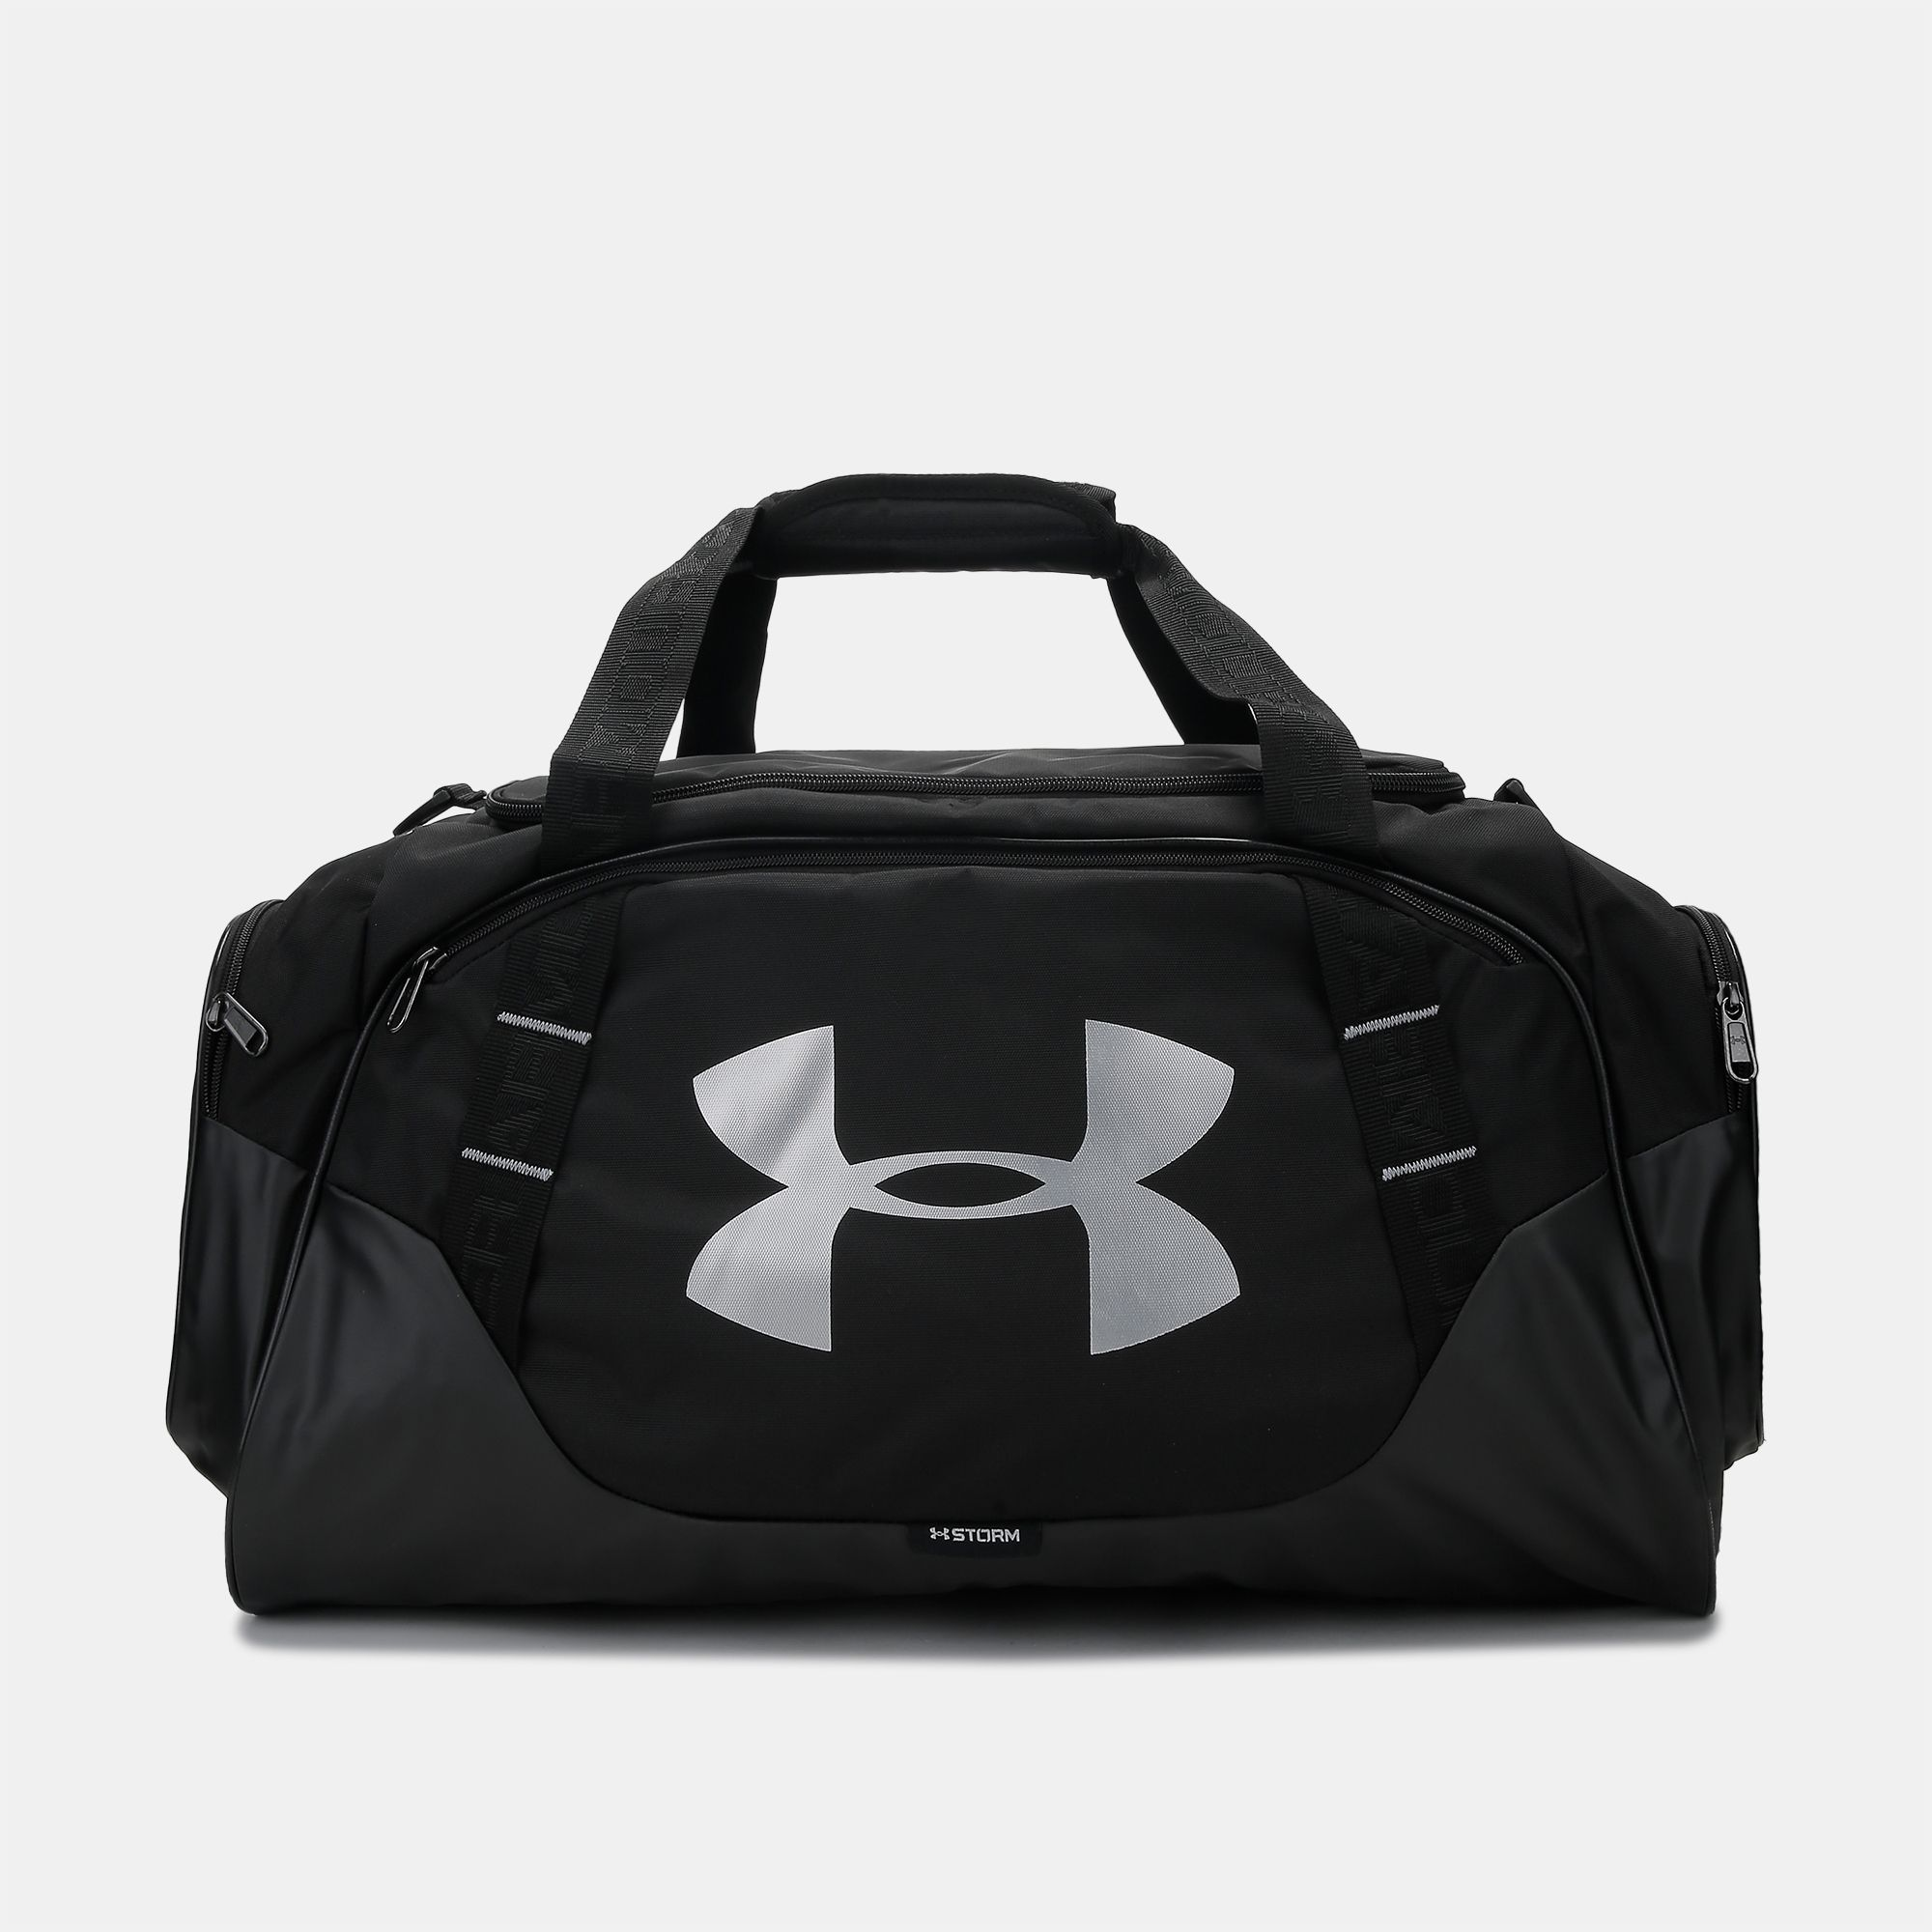 ff9106320a Shop Black Under Armour Undeniable 3.0 Medium Duffle Bag for Unisex ...